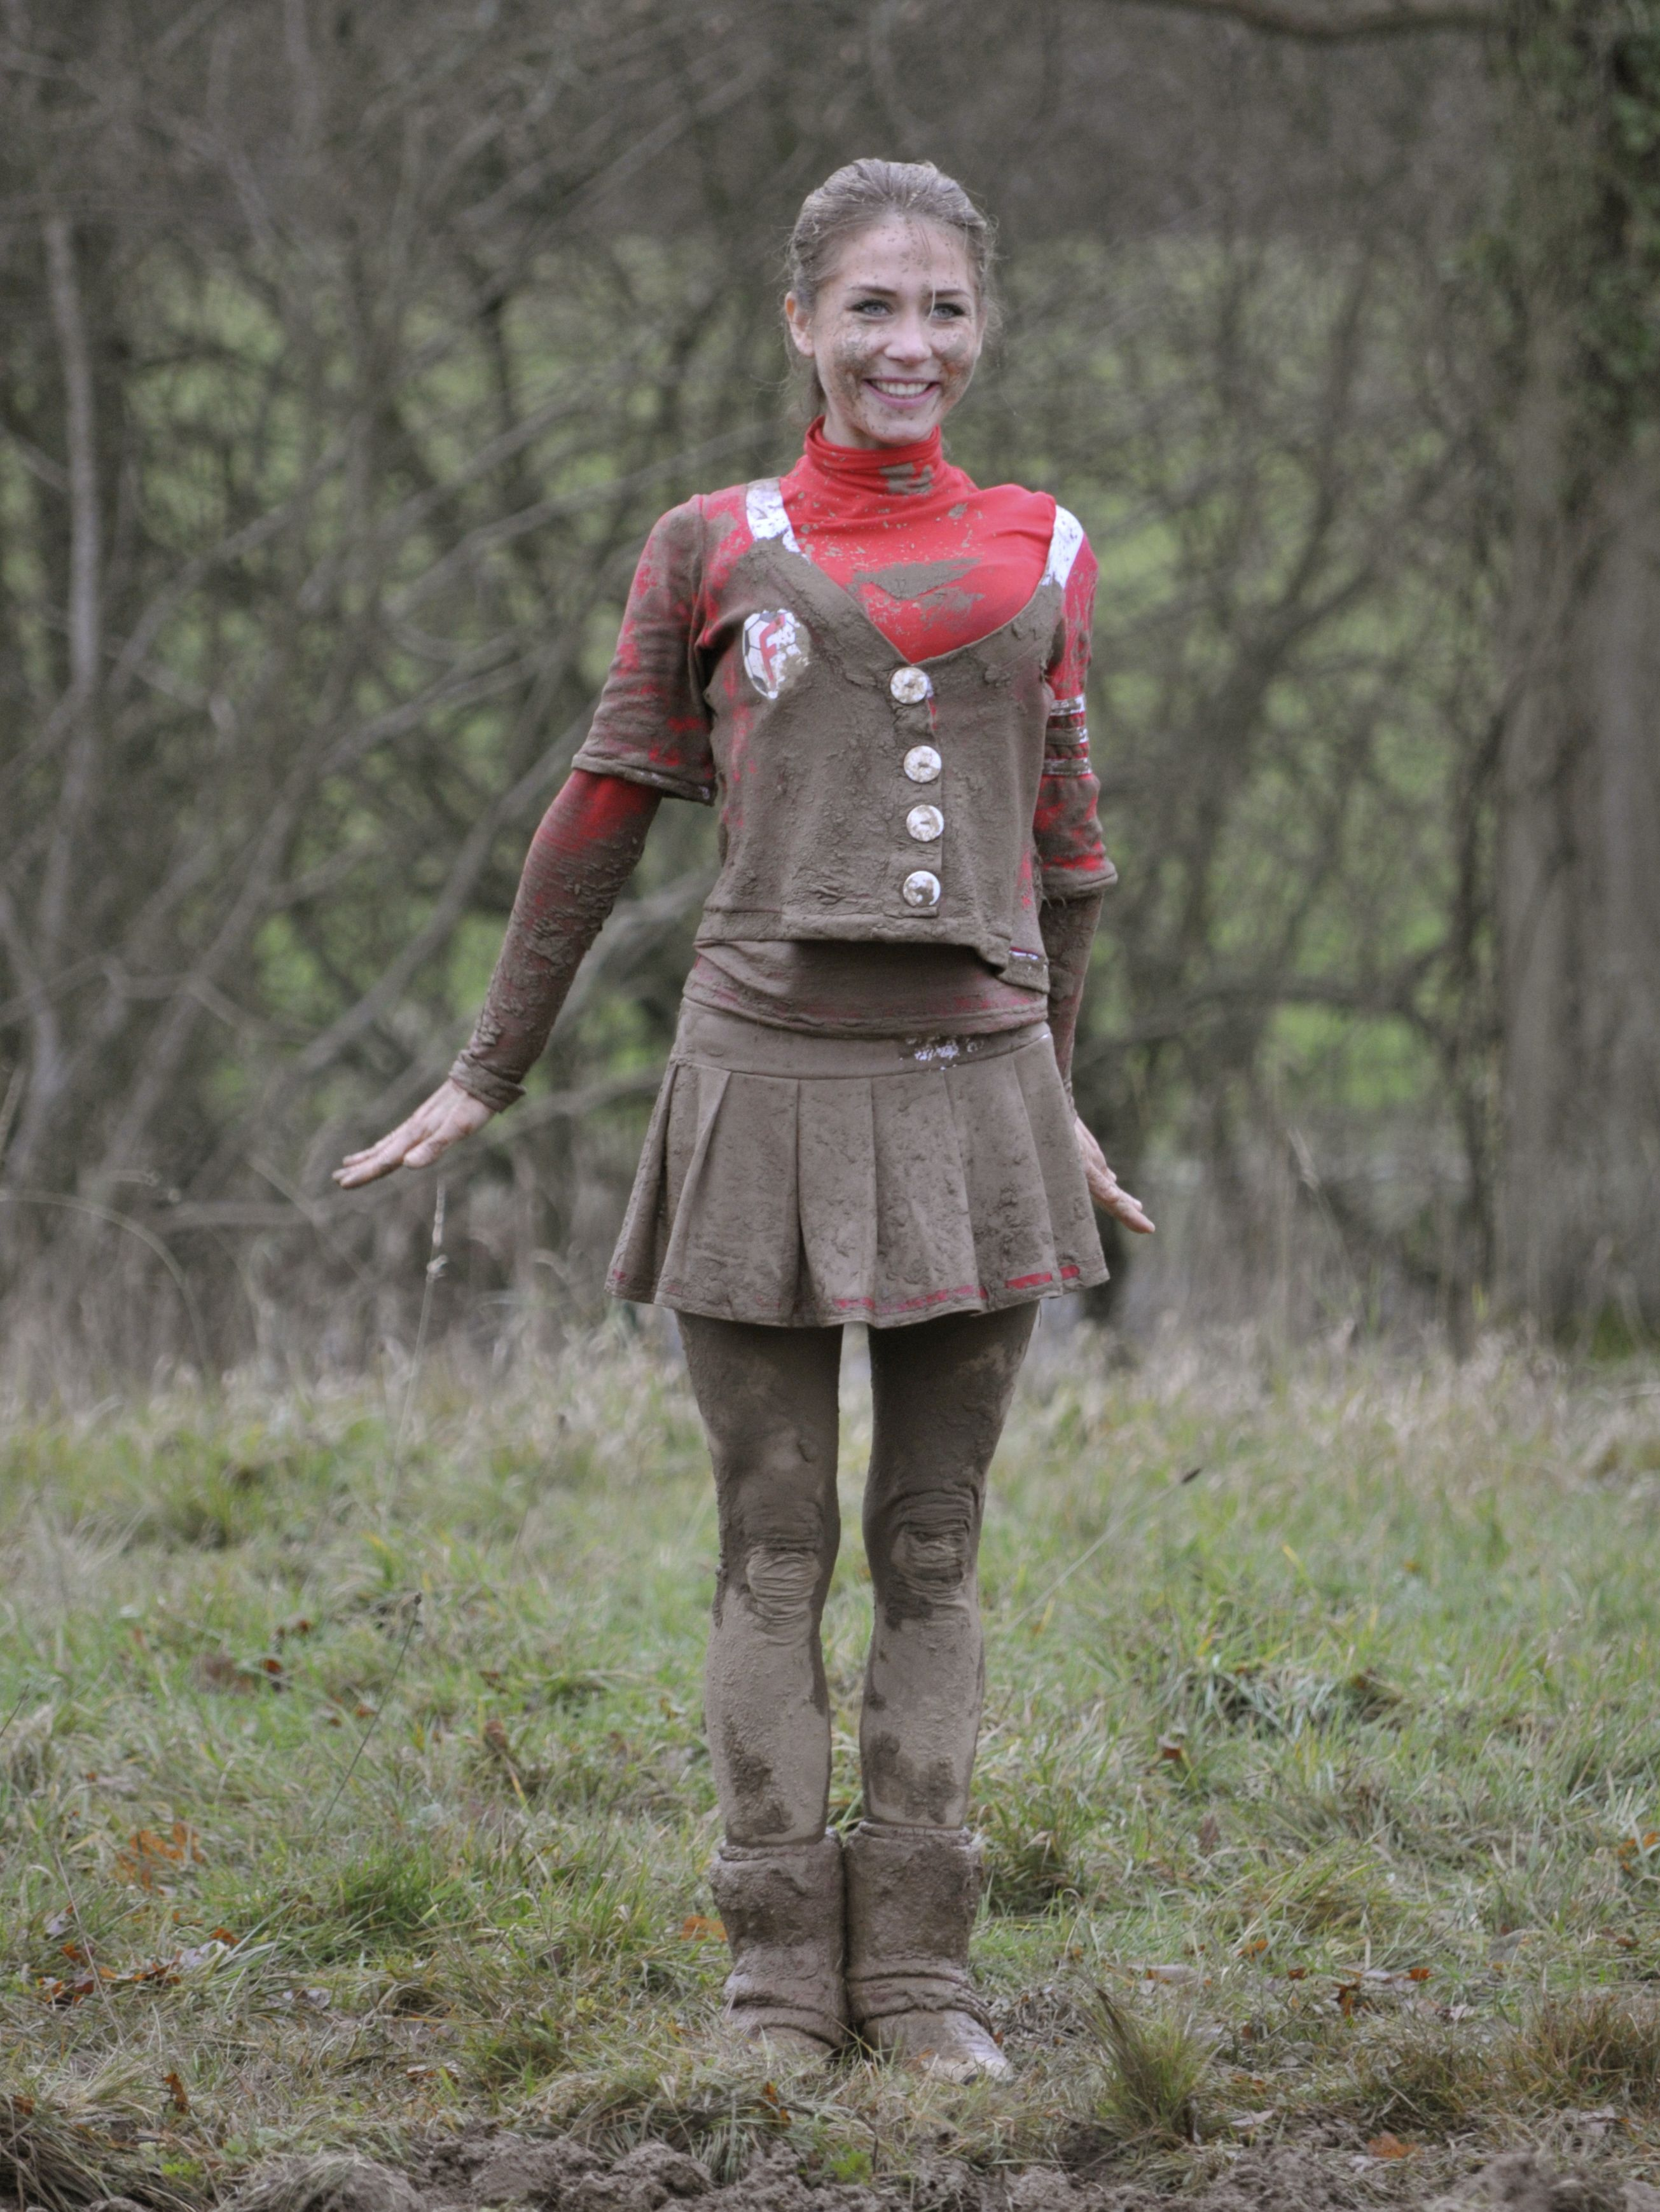 girls in mud Google Search Mudding girls, Girl, Fashion